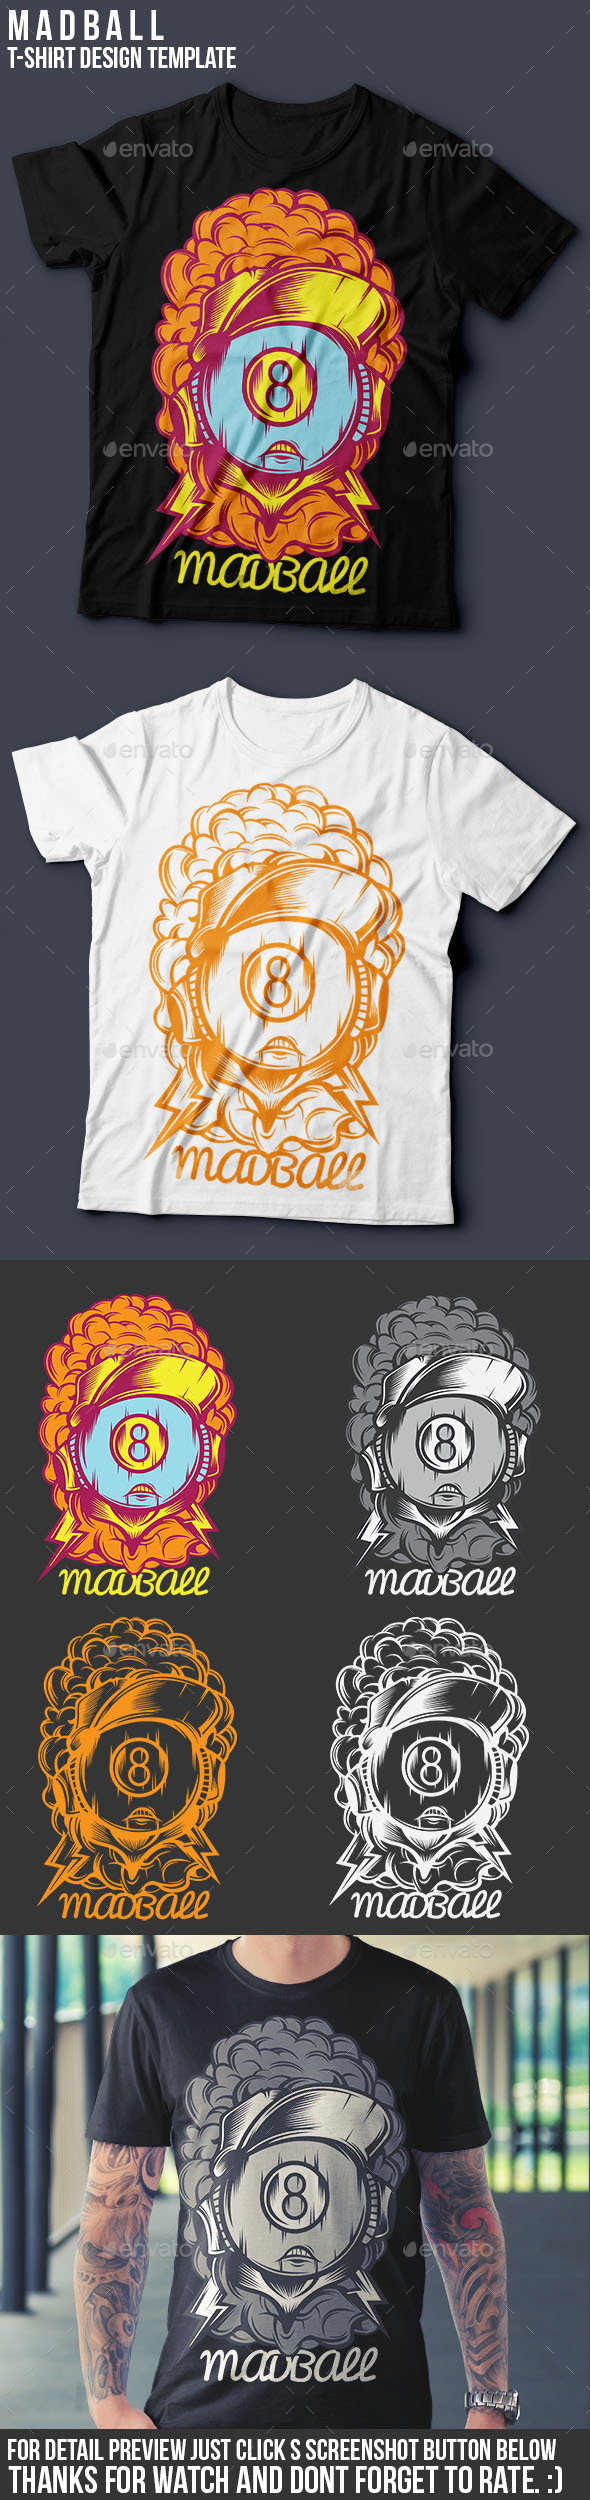 Madball T-Shirt Template - Funny Designs